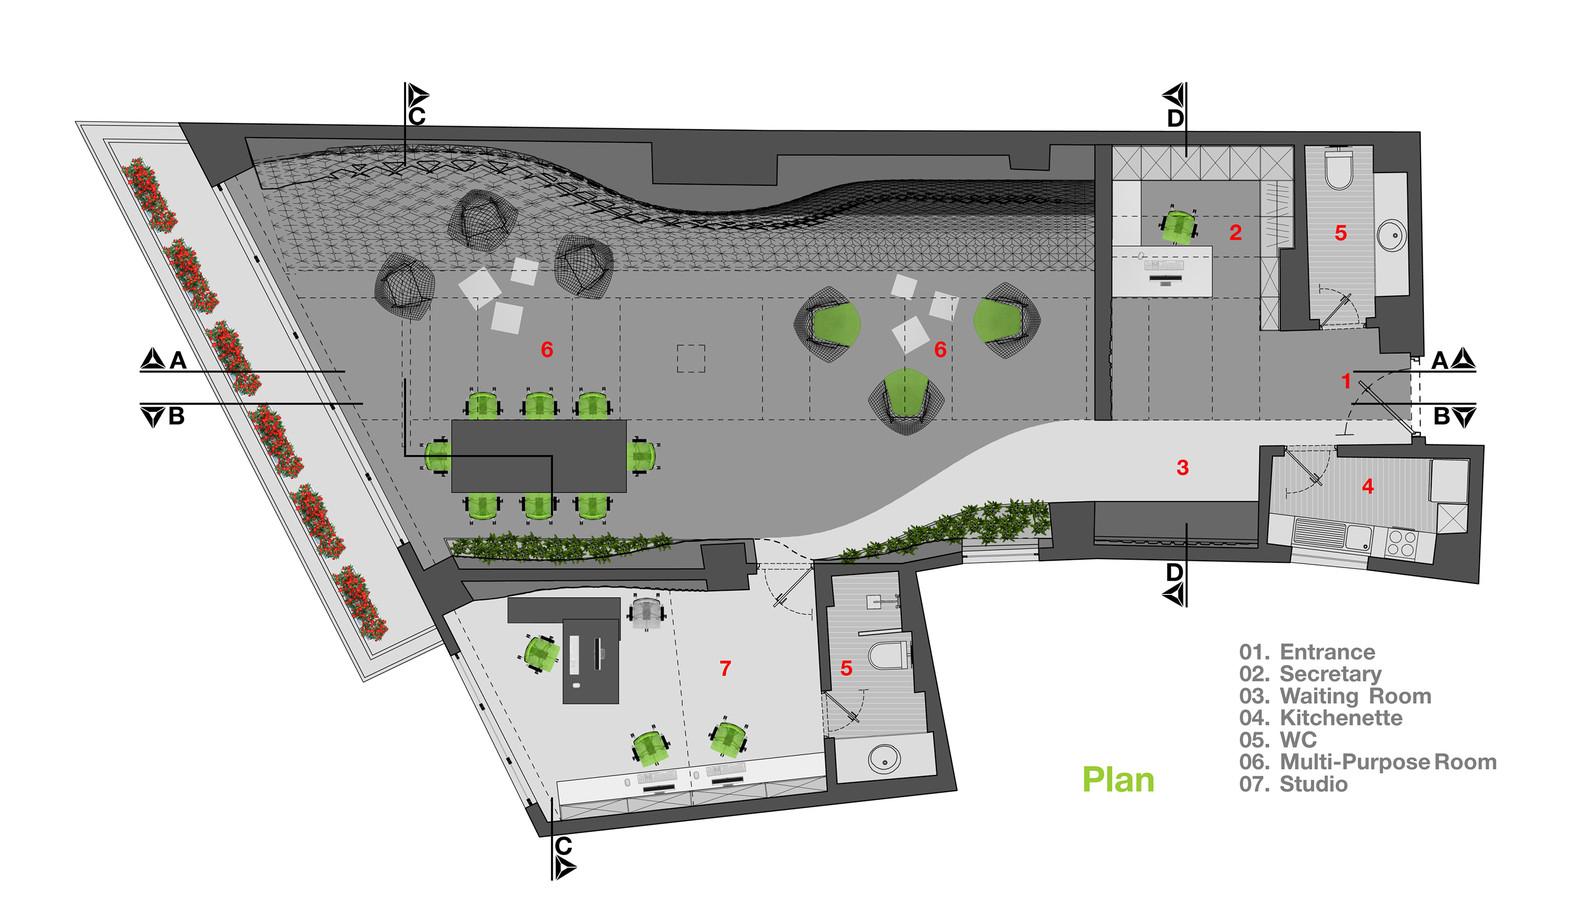 gallery of diyar media studio rena design 19 diyar media studio floor plan